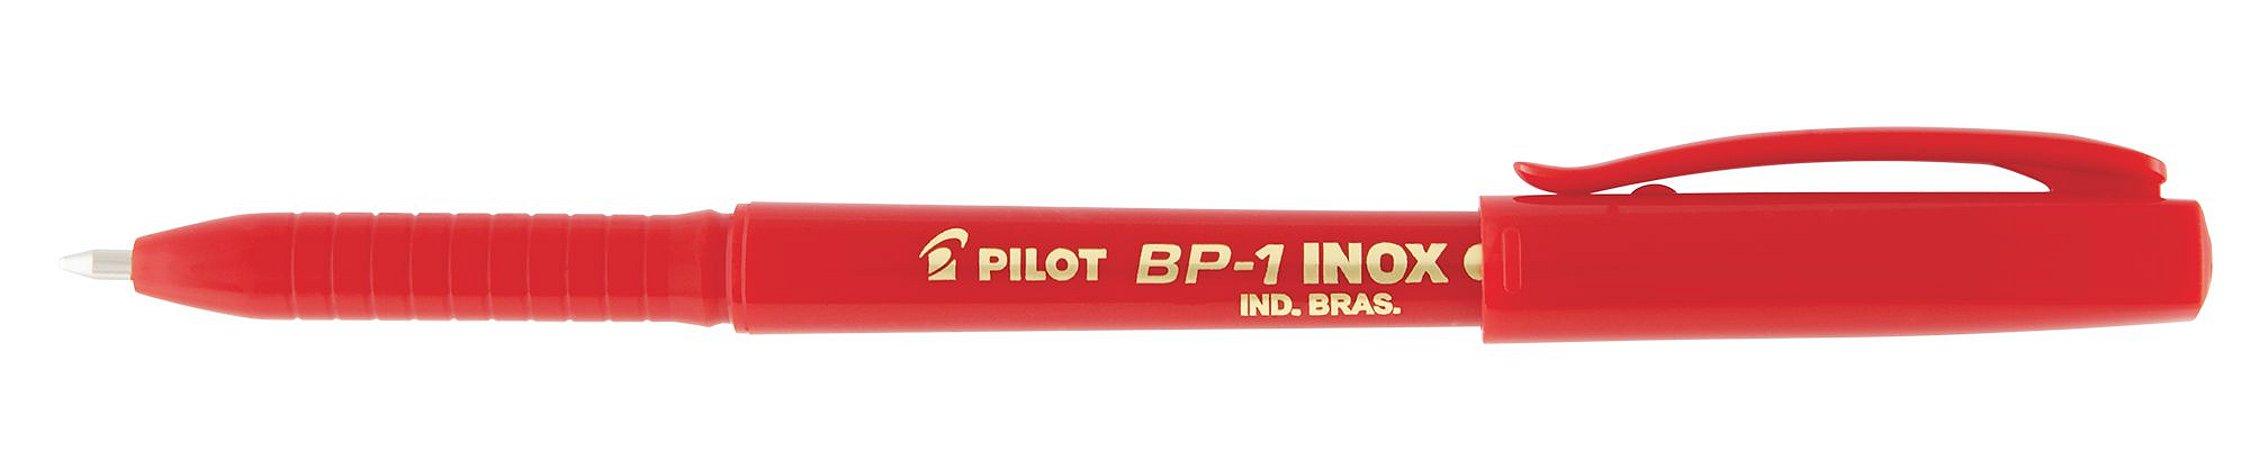 CANETA ESFEROGRÁFICA BP-1 INOX 1.0MM VERMELHA - PILOT